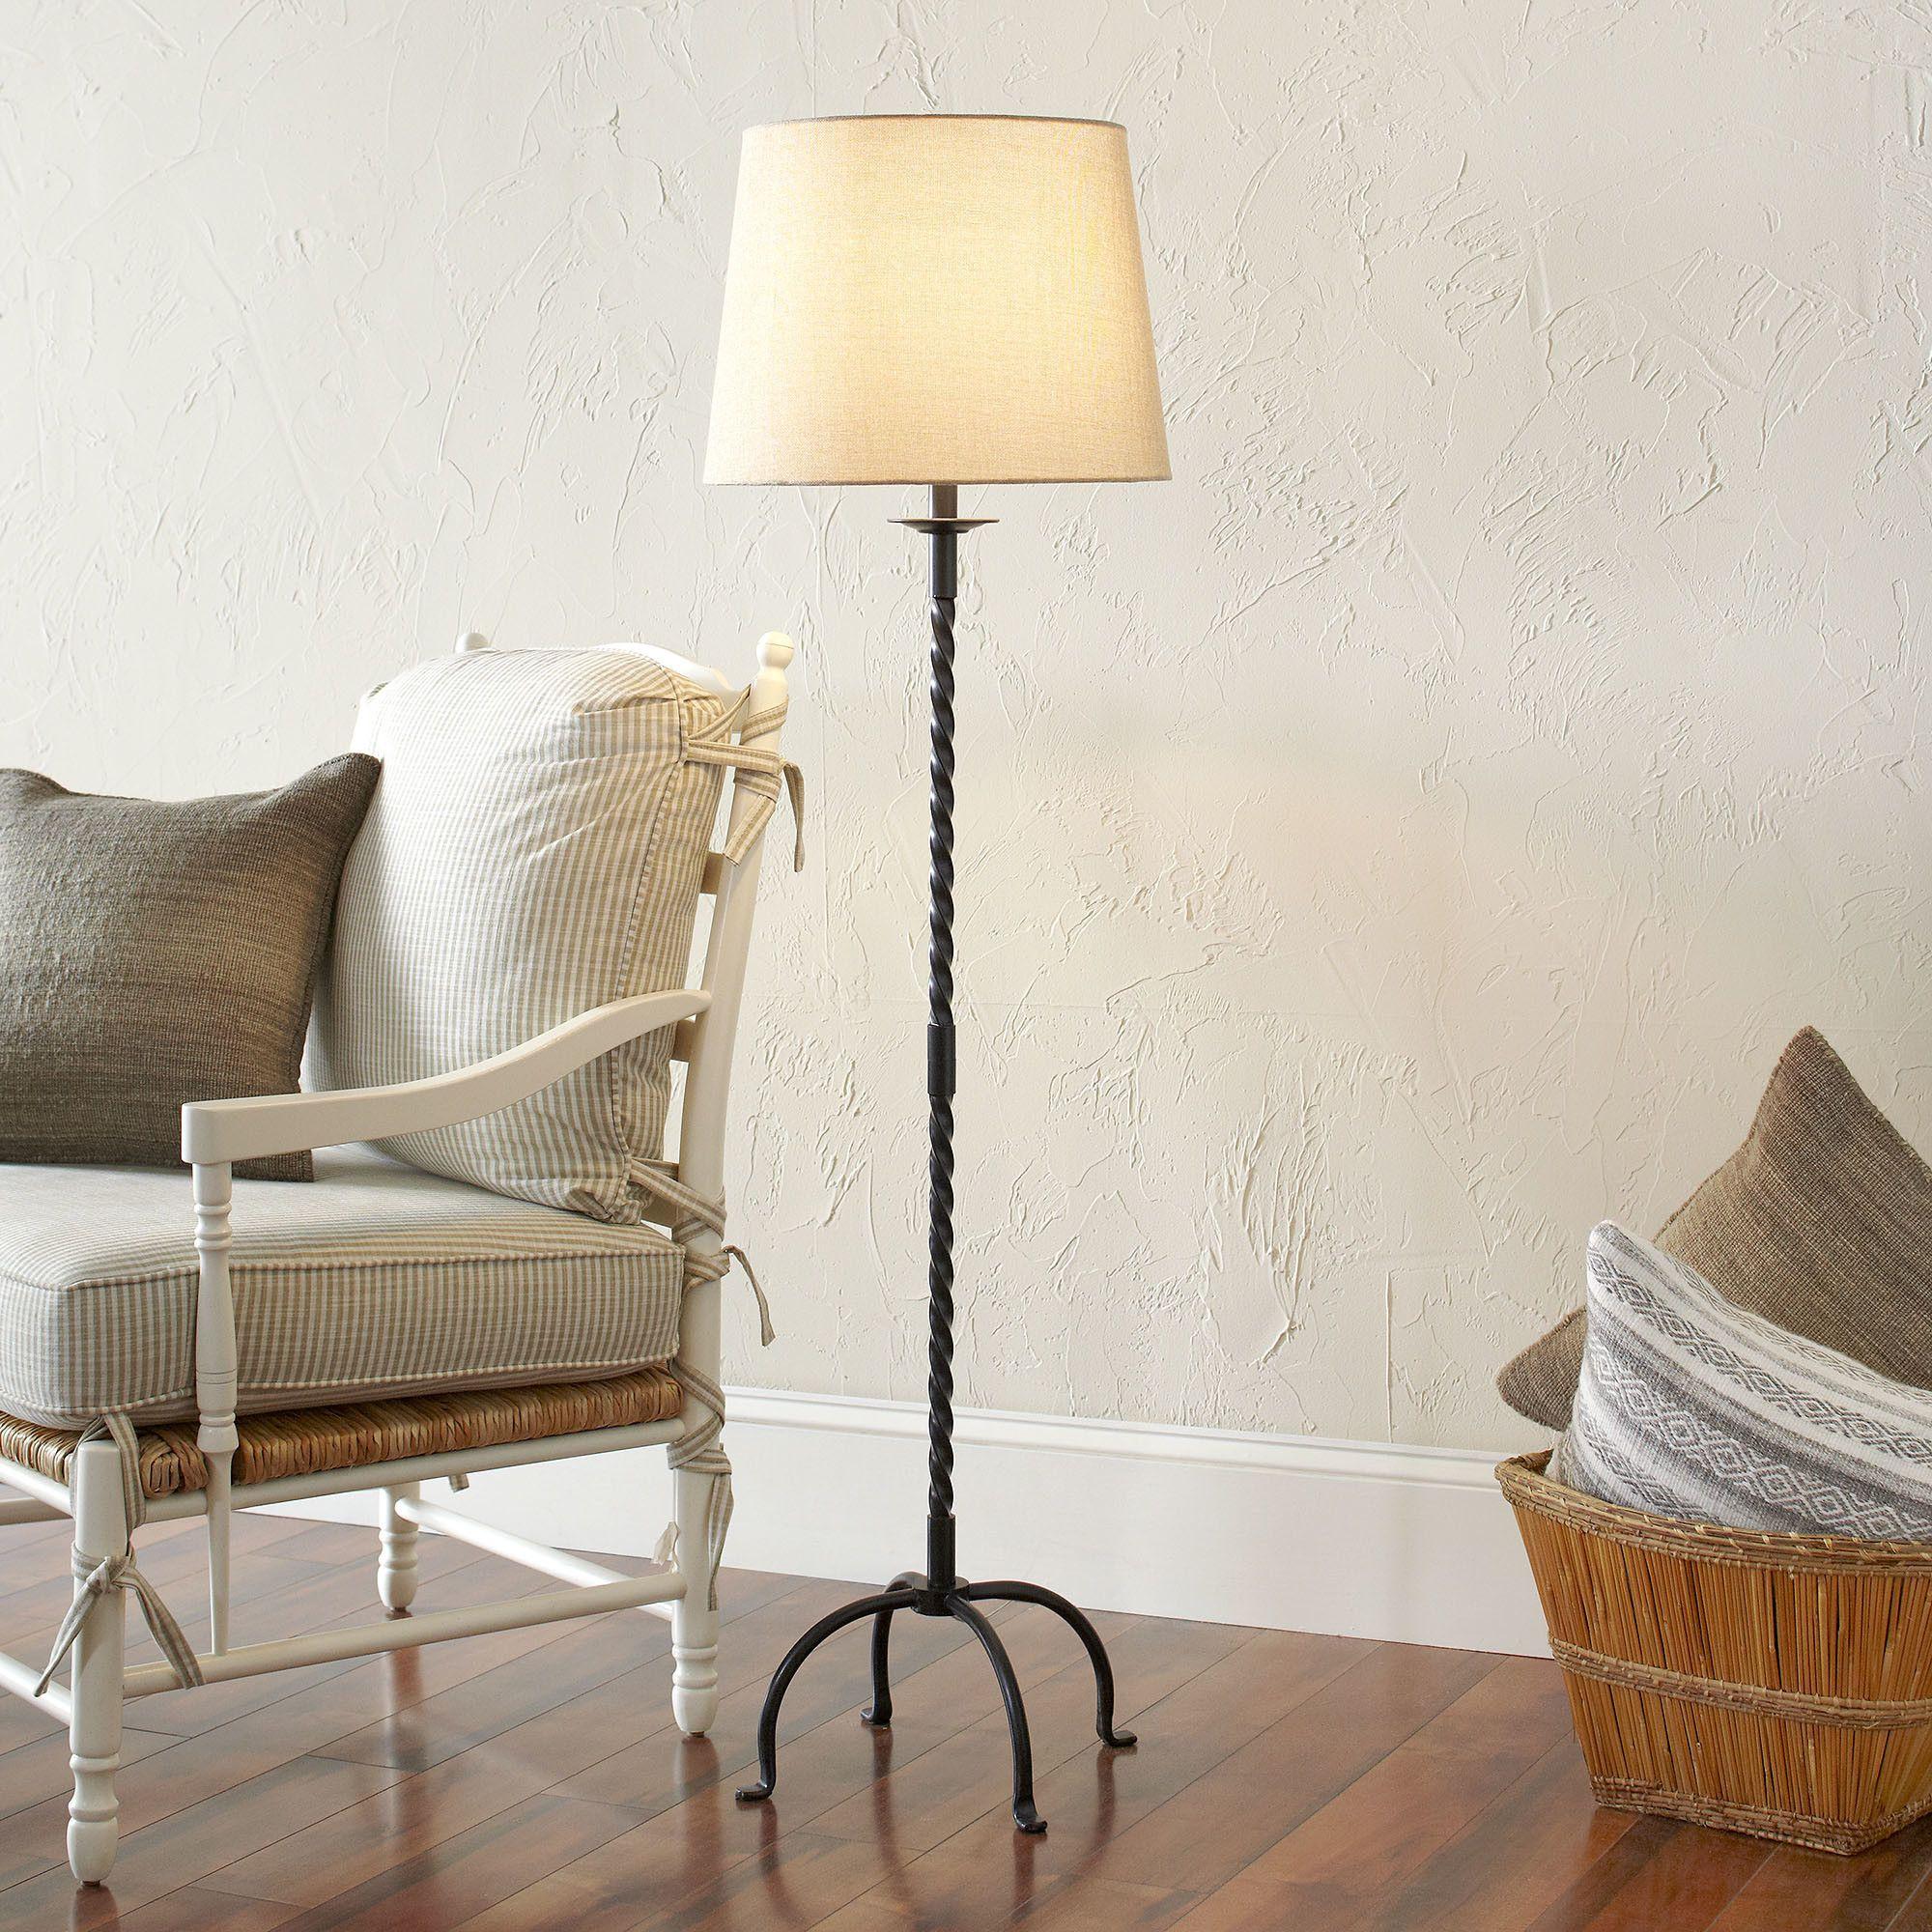 Mullins Floor Lamp Floor Lamp Farmhouse Floor Lamps Floor Lamps Living Room